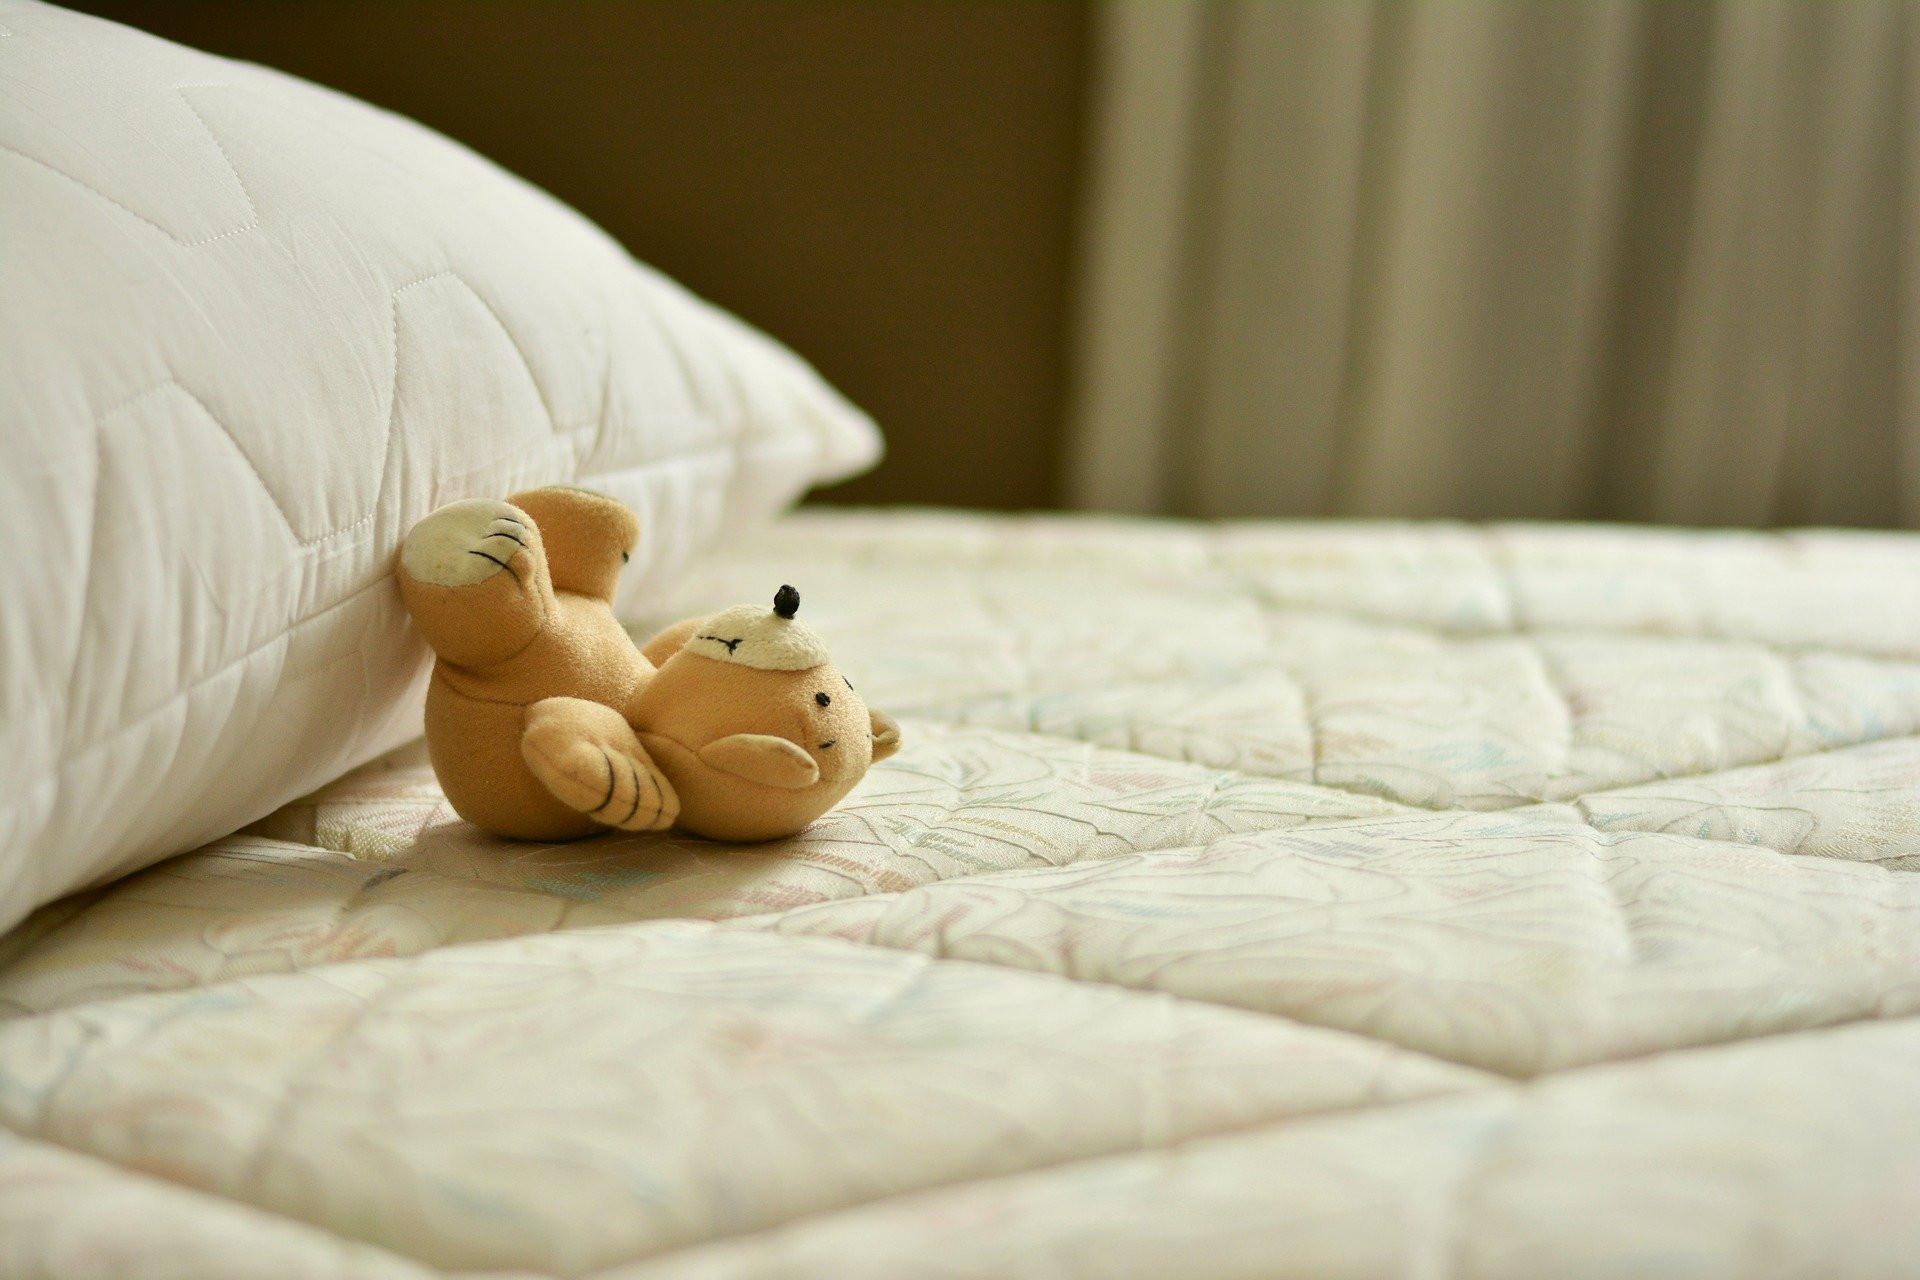 co może mieszkać w materacu materace sypialnia